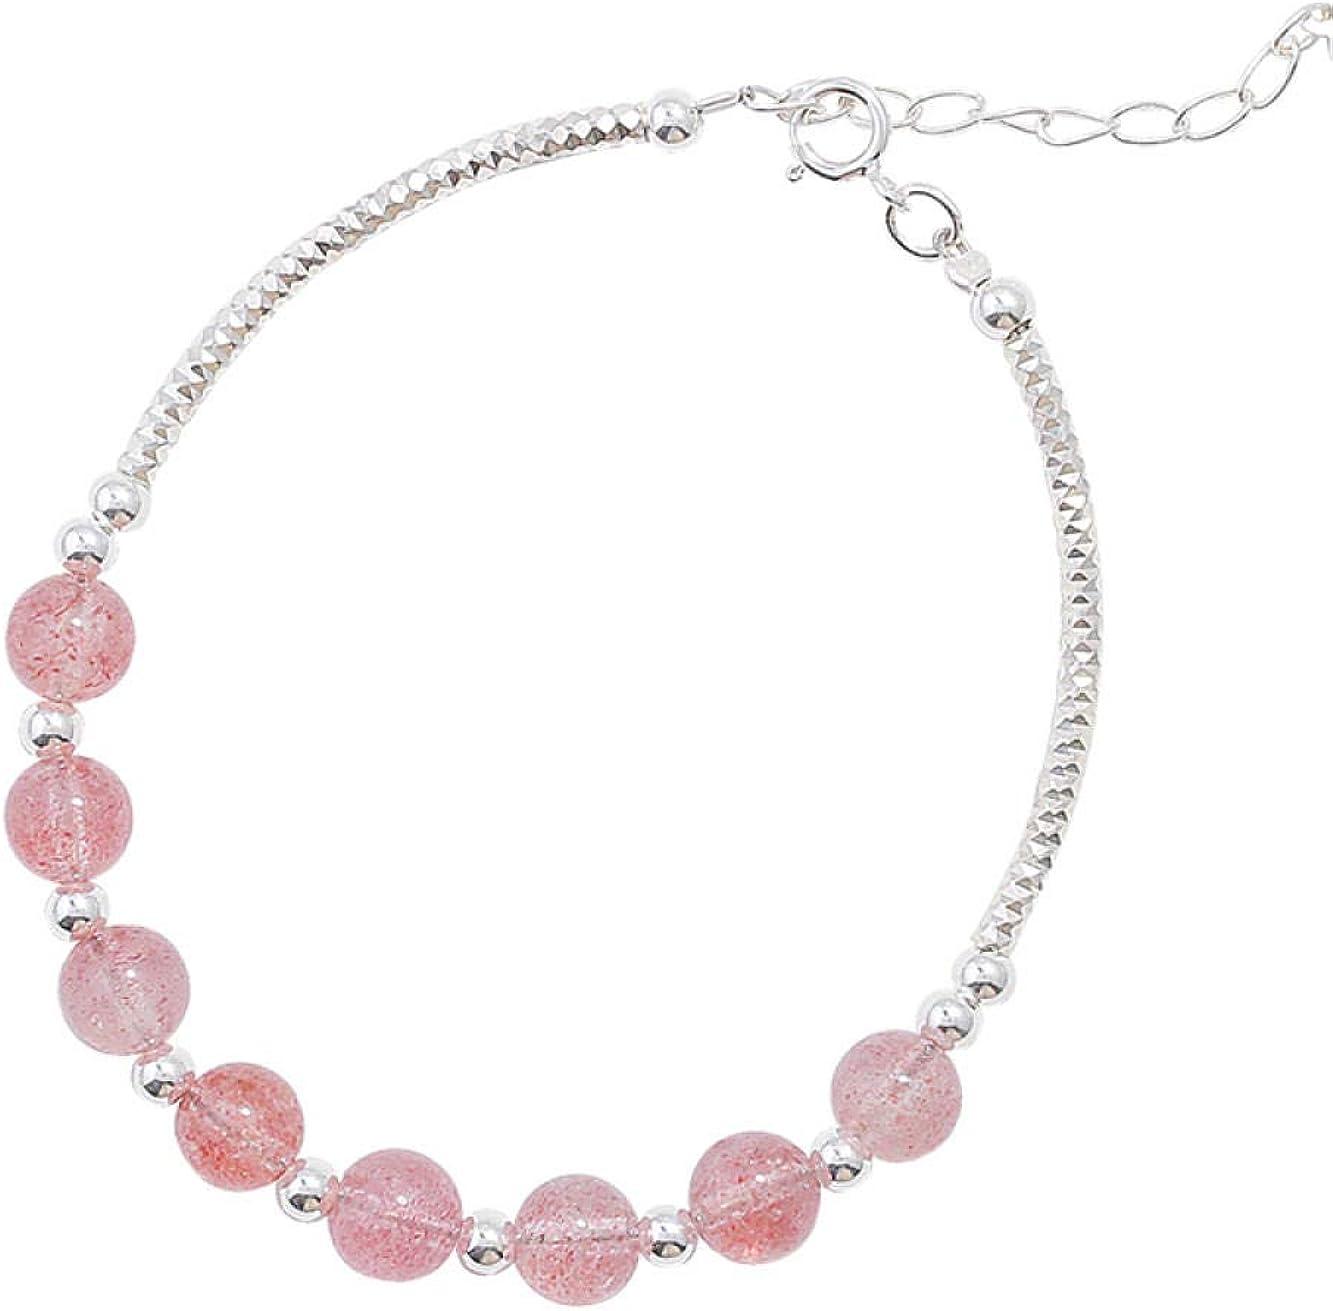 JJLEzlAM Bangle925 Silver Strawberry Crystal Peach Fees free!! Bracelet Super special price Blo